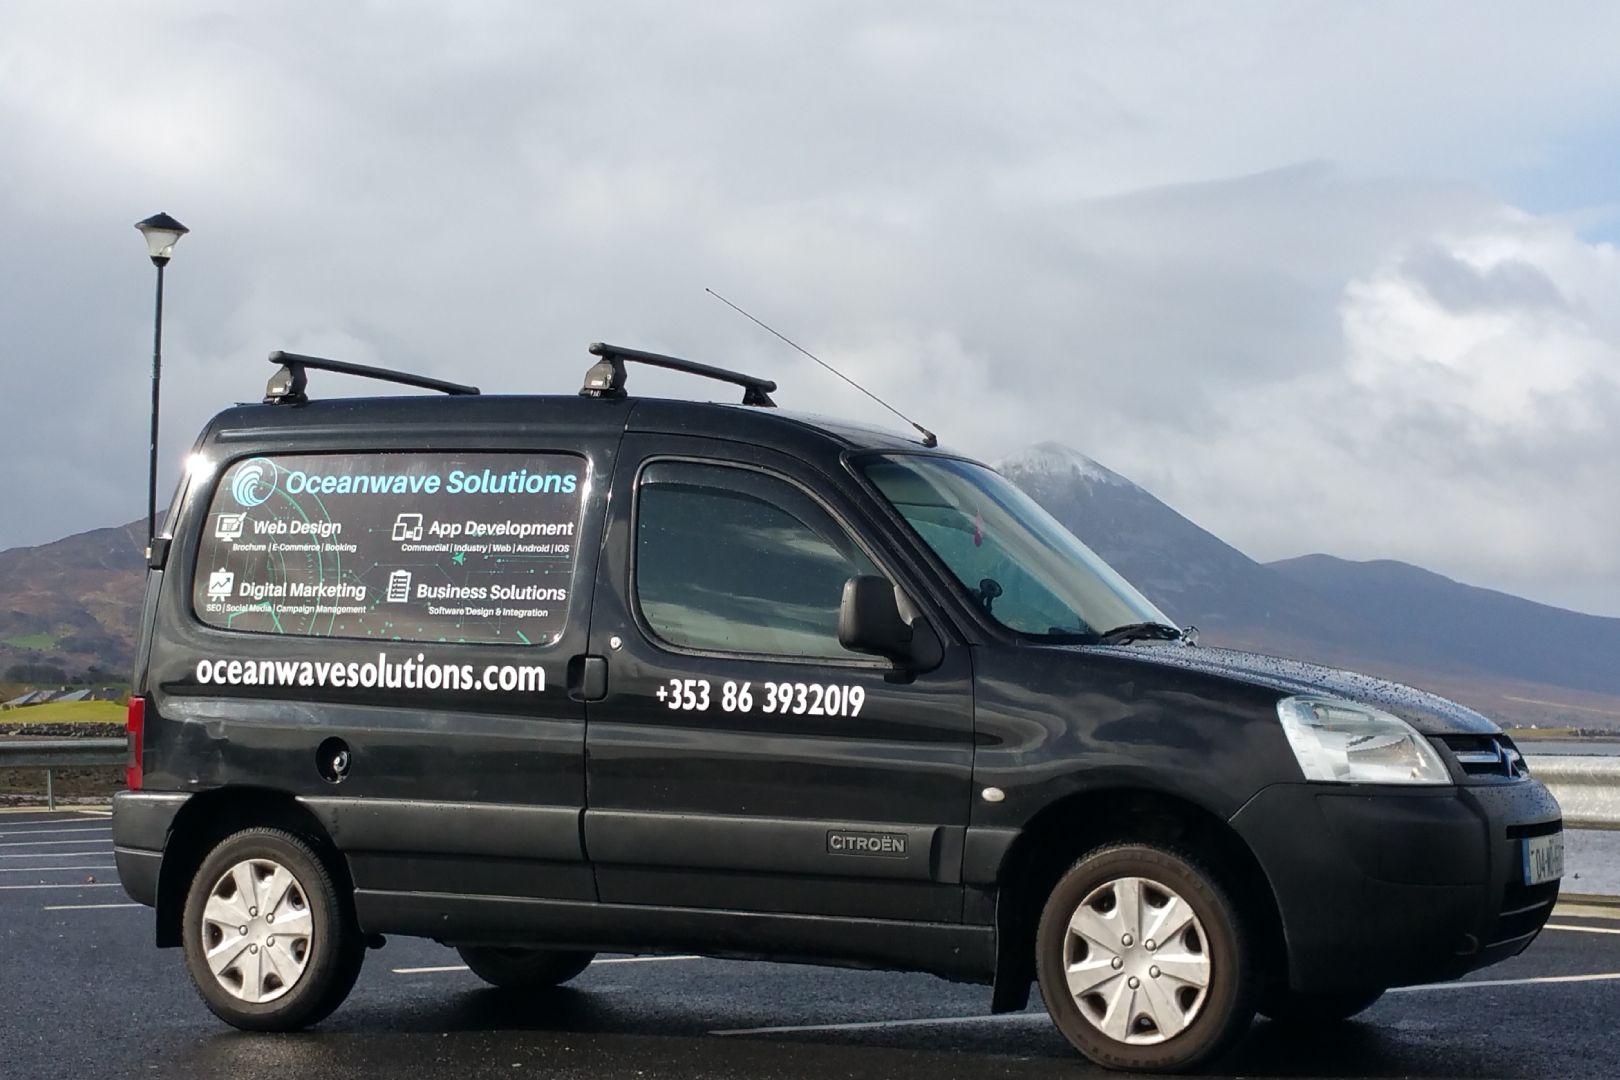 Oceanwave Solutions Van